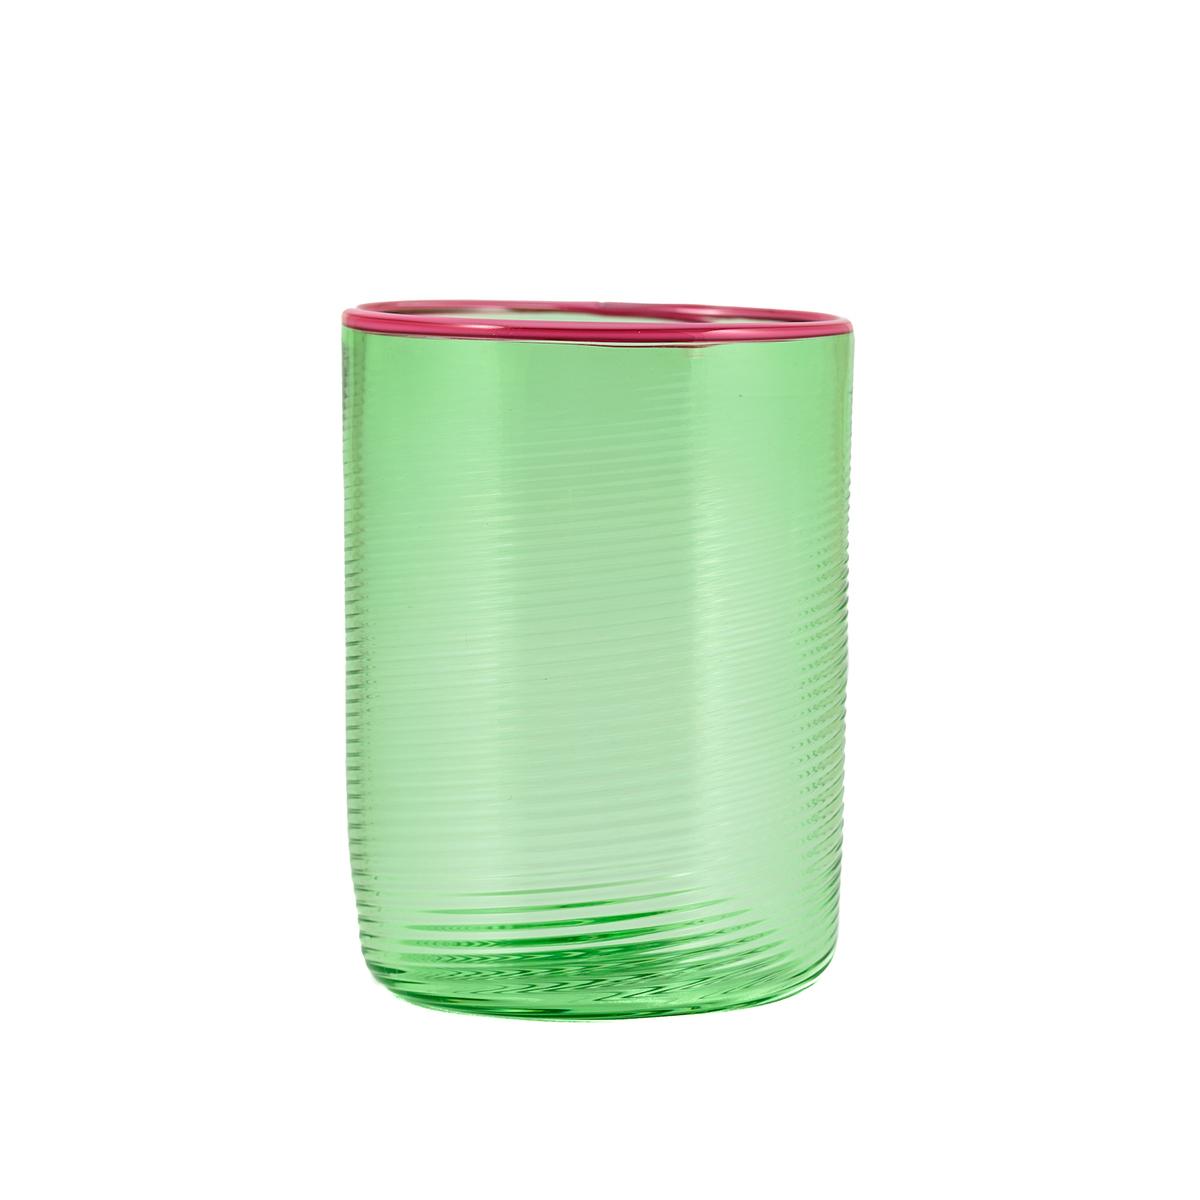 fizzy-water-green-pink-glass-murano-glassware